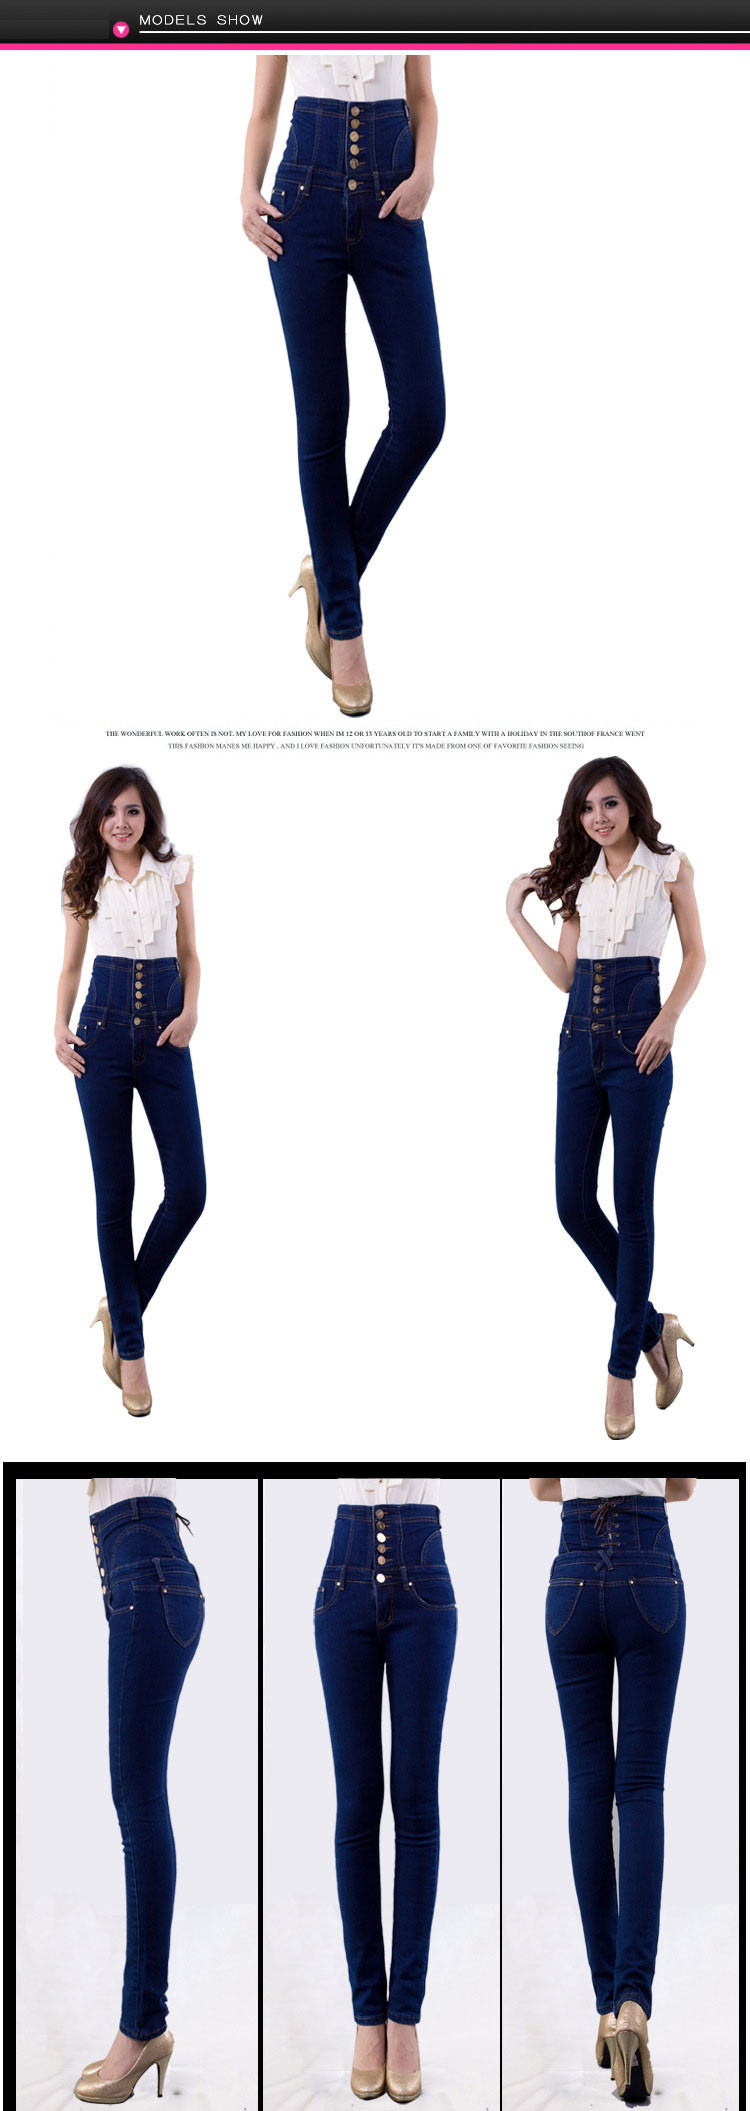 00018454fcc5a 2019 Fashion Vintage Women S Empire Waist Jeans Woman Skinny Super ...